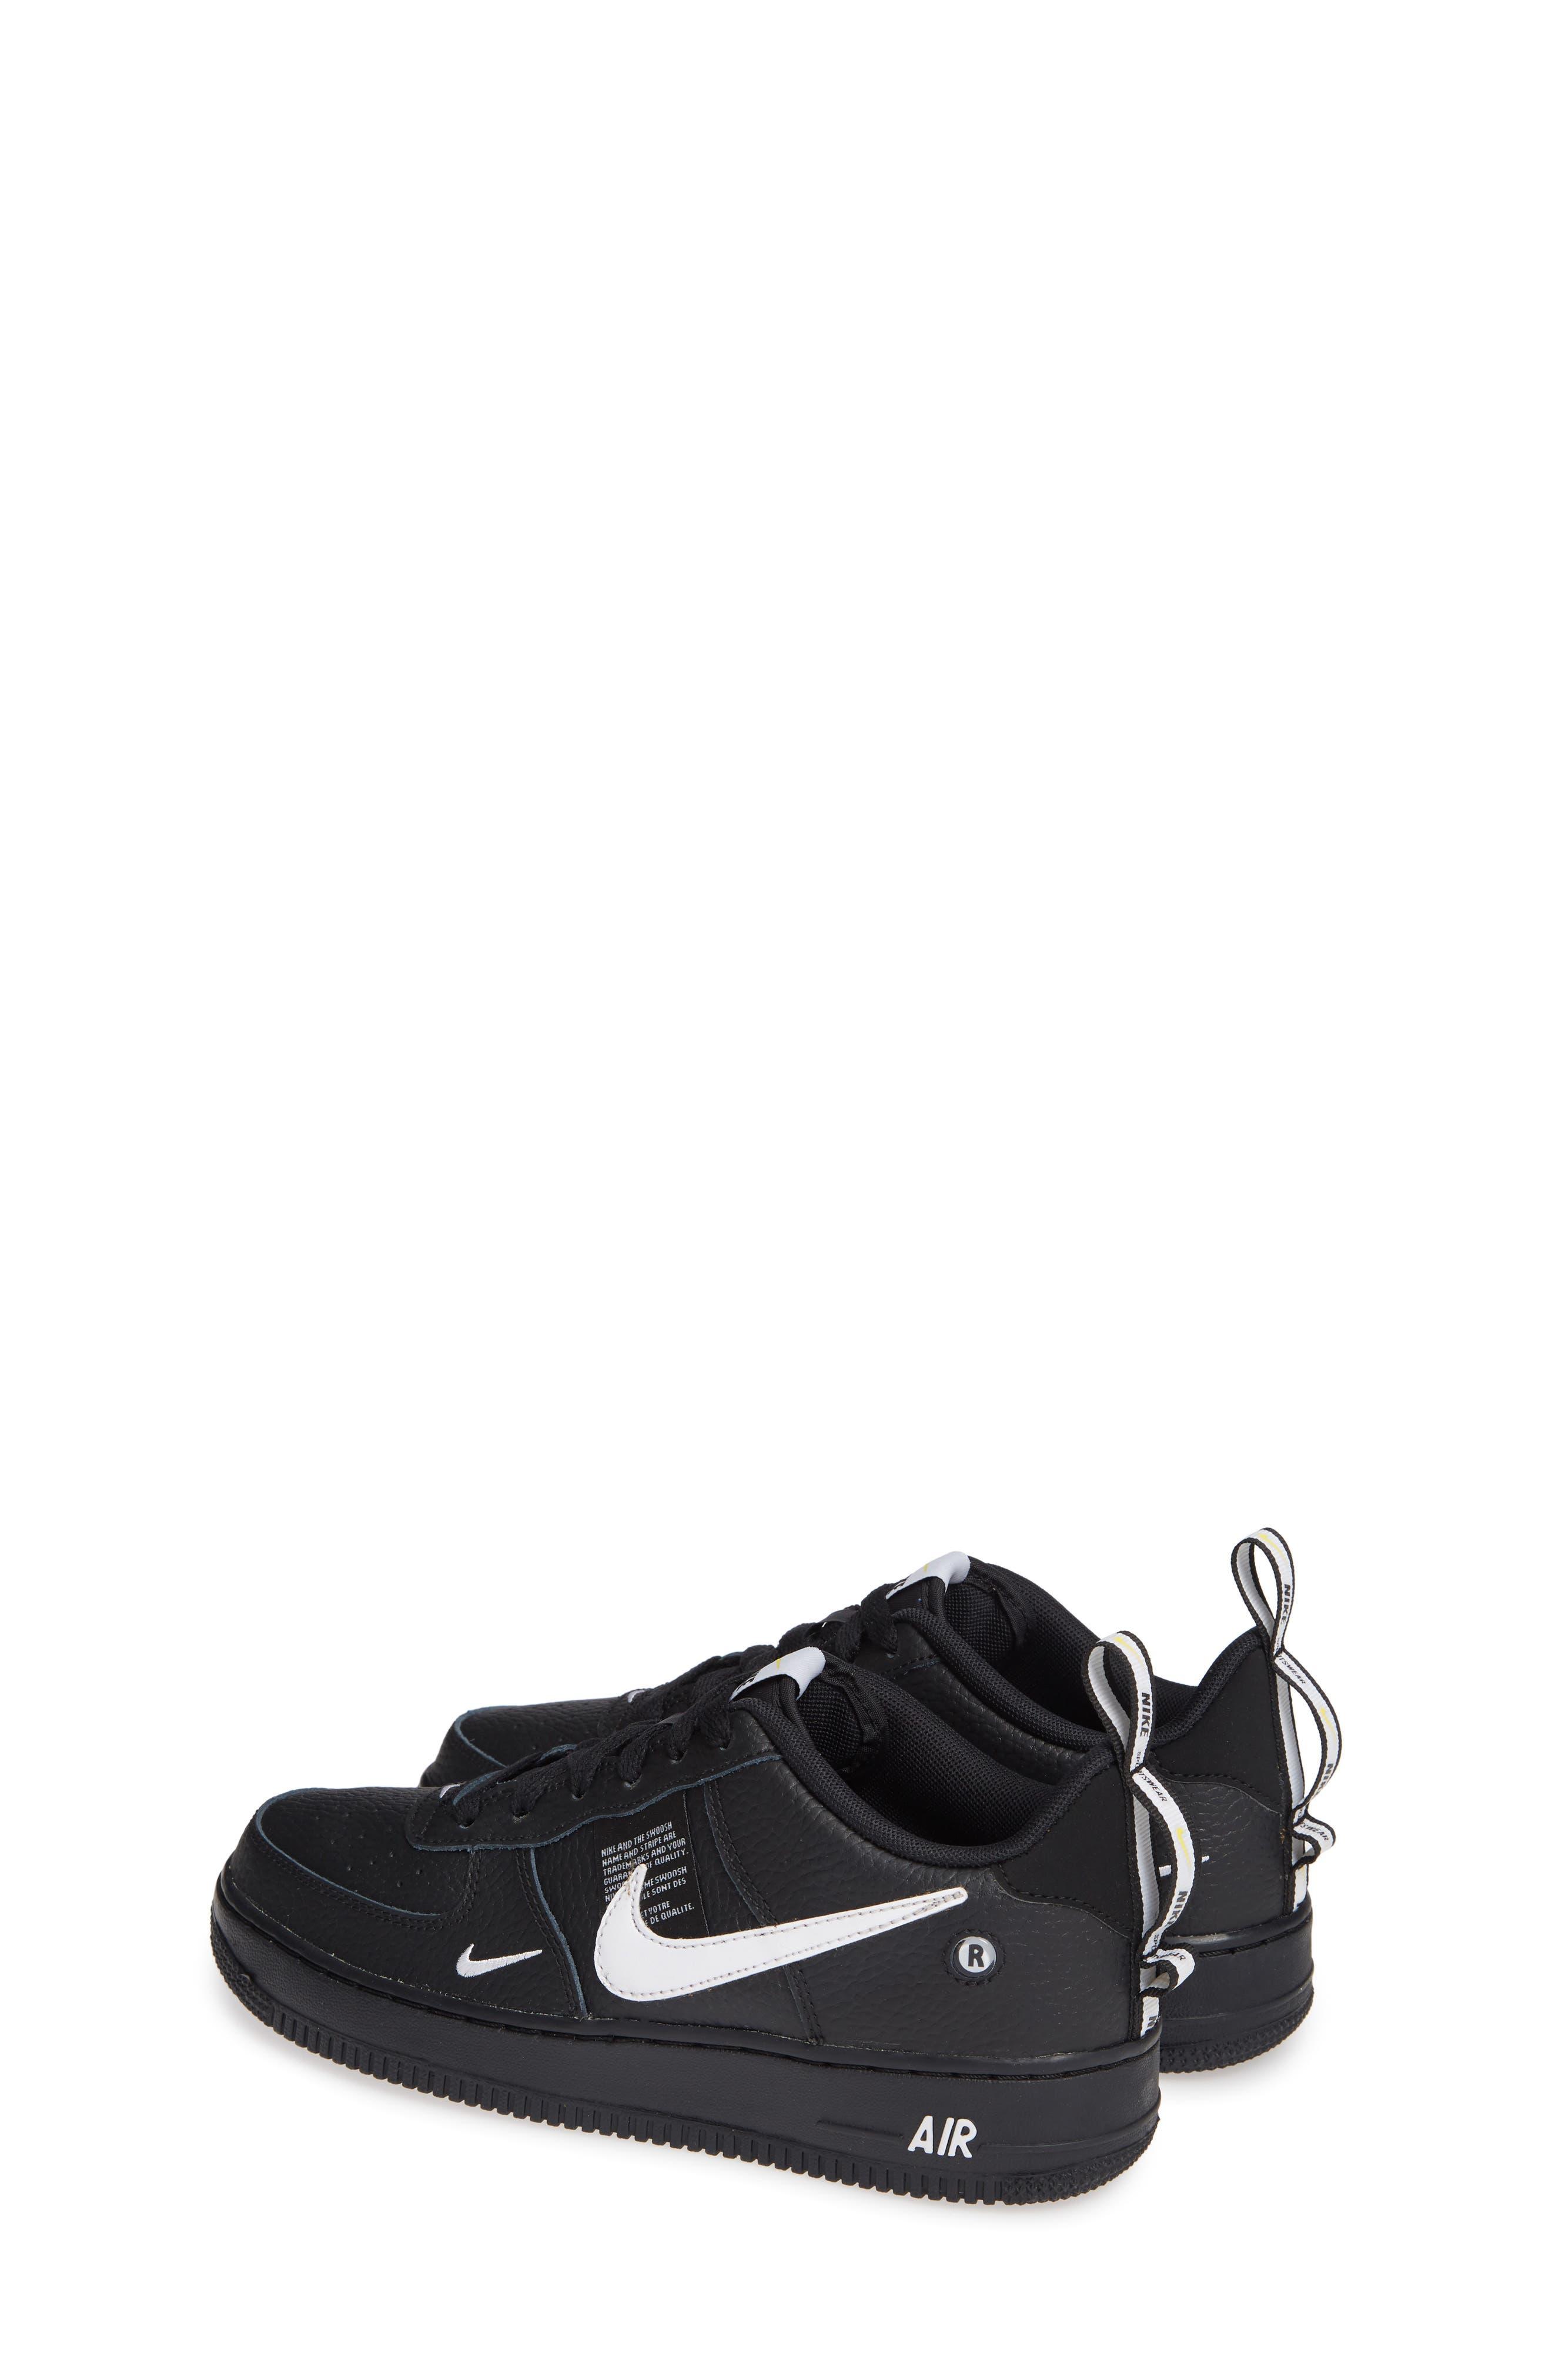 NIKE,                             Air Force 1 LV8 Sneaker,                             Alternate thumbnail 3, color,                             BLACK/ WHITE-BLACK-TOUR YELLOW